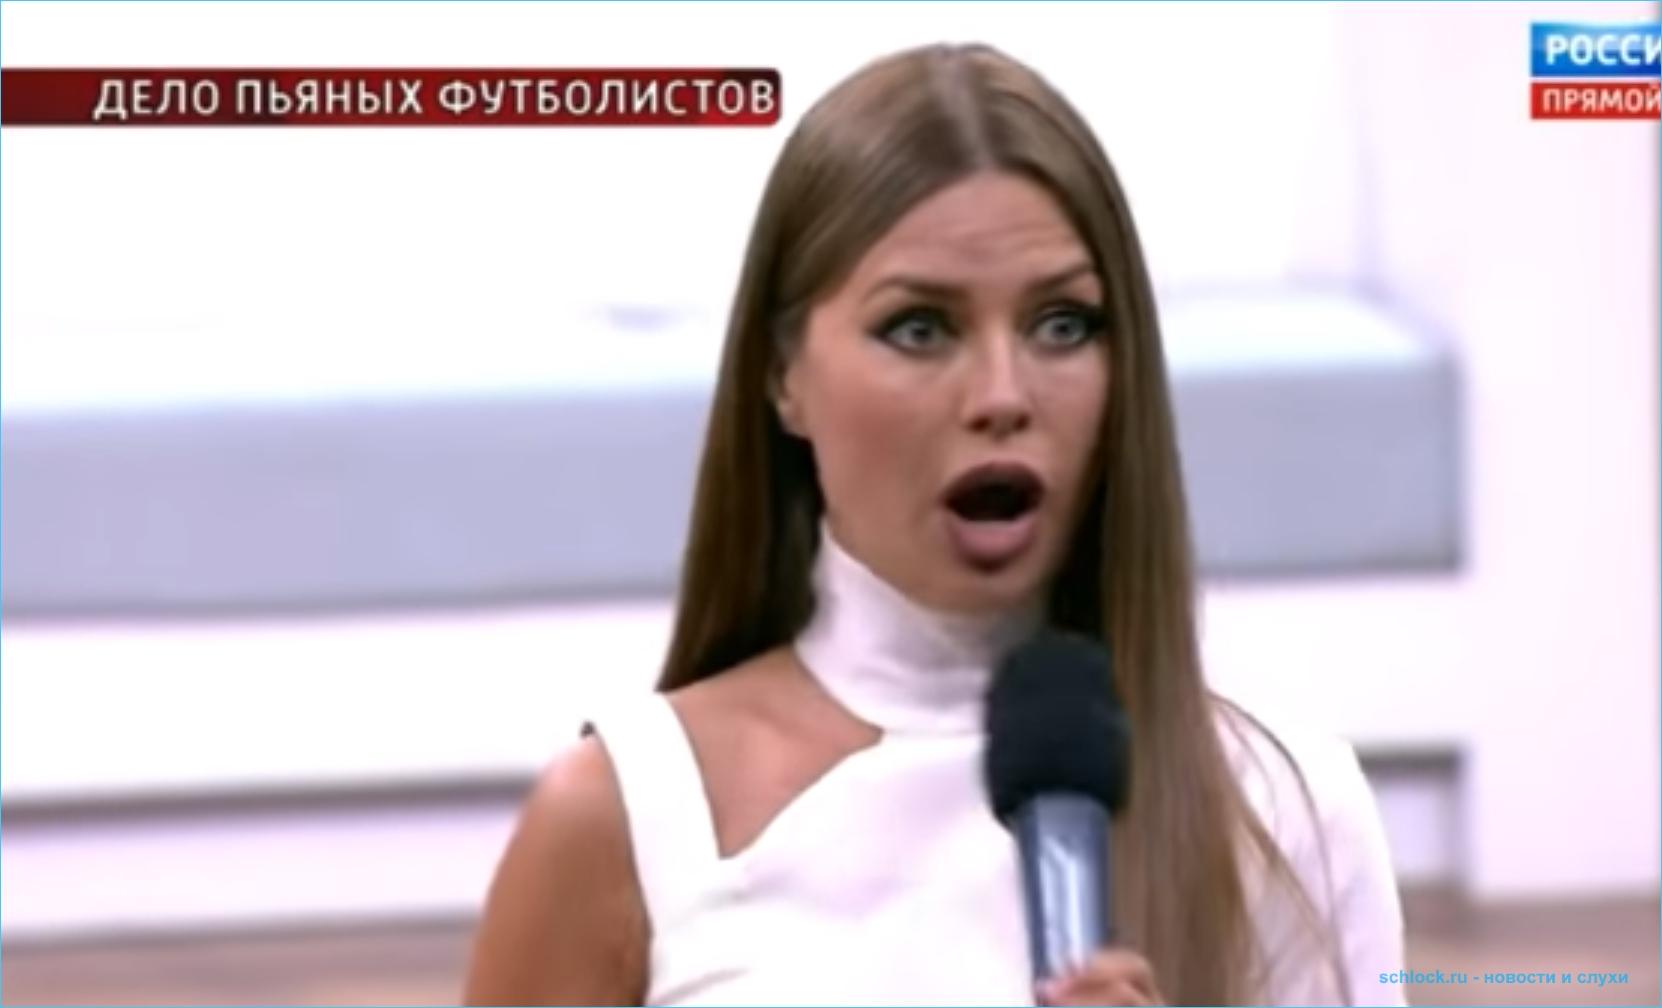 Виктория Боня опозорилась на съемках «Прямого эфира»